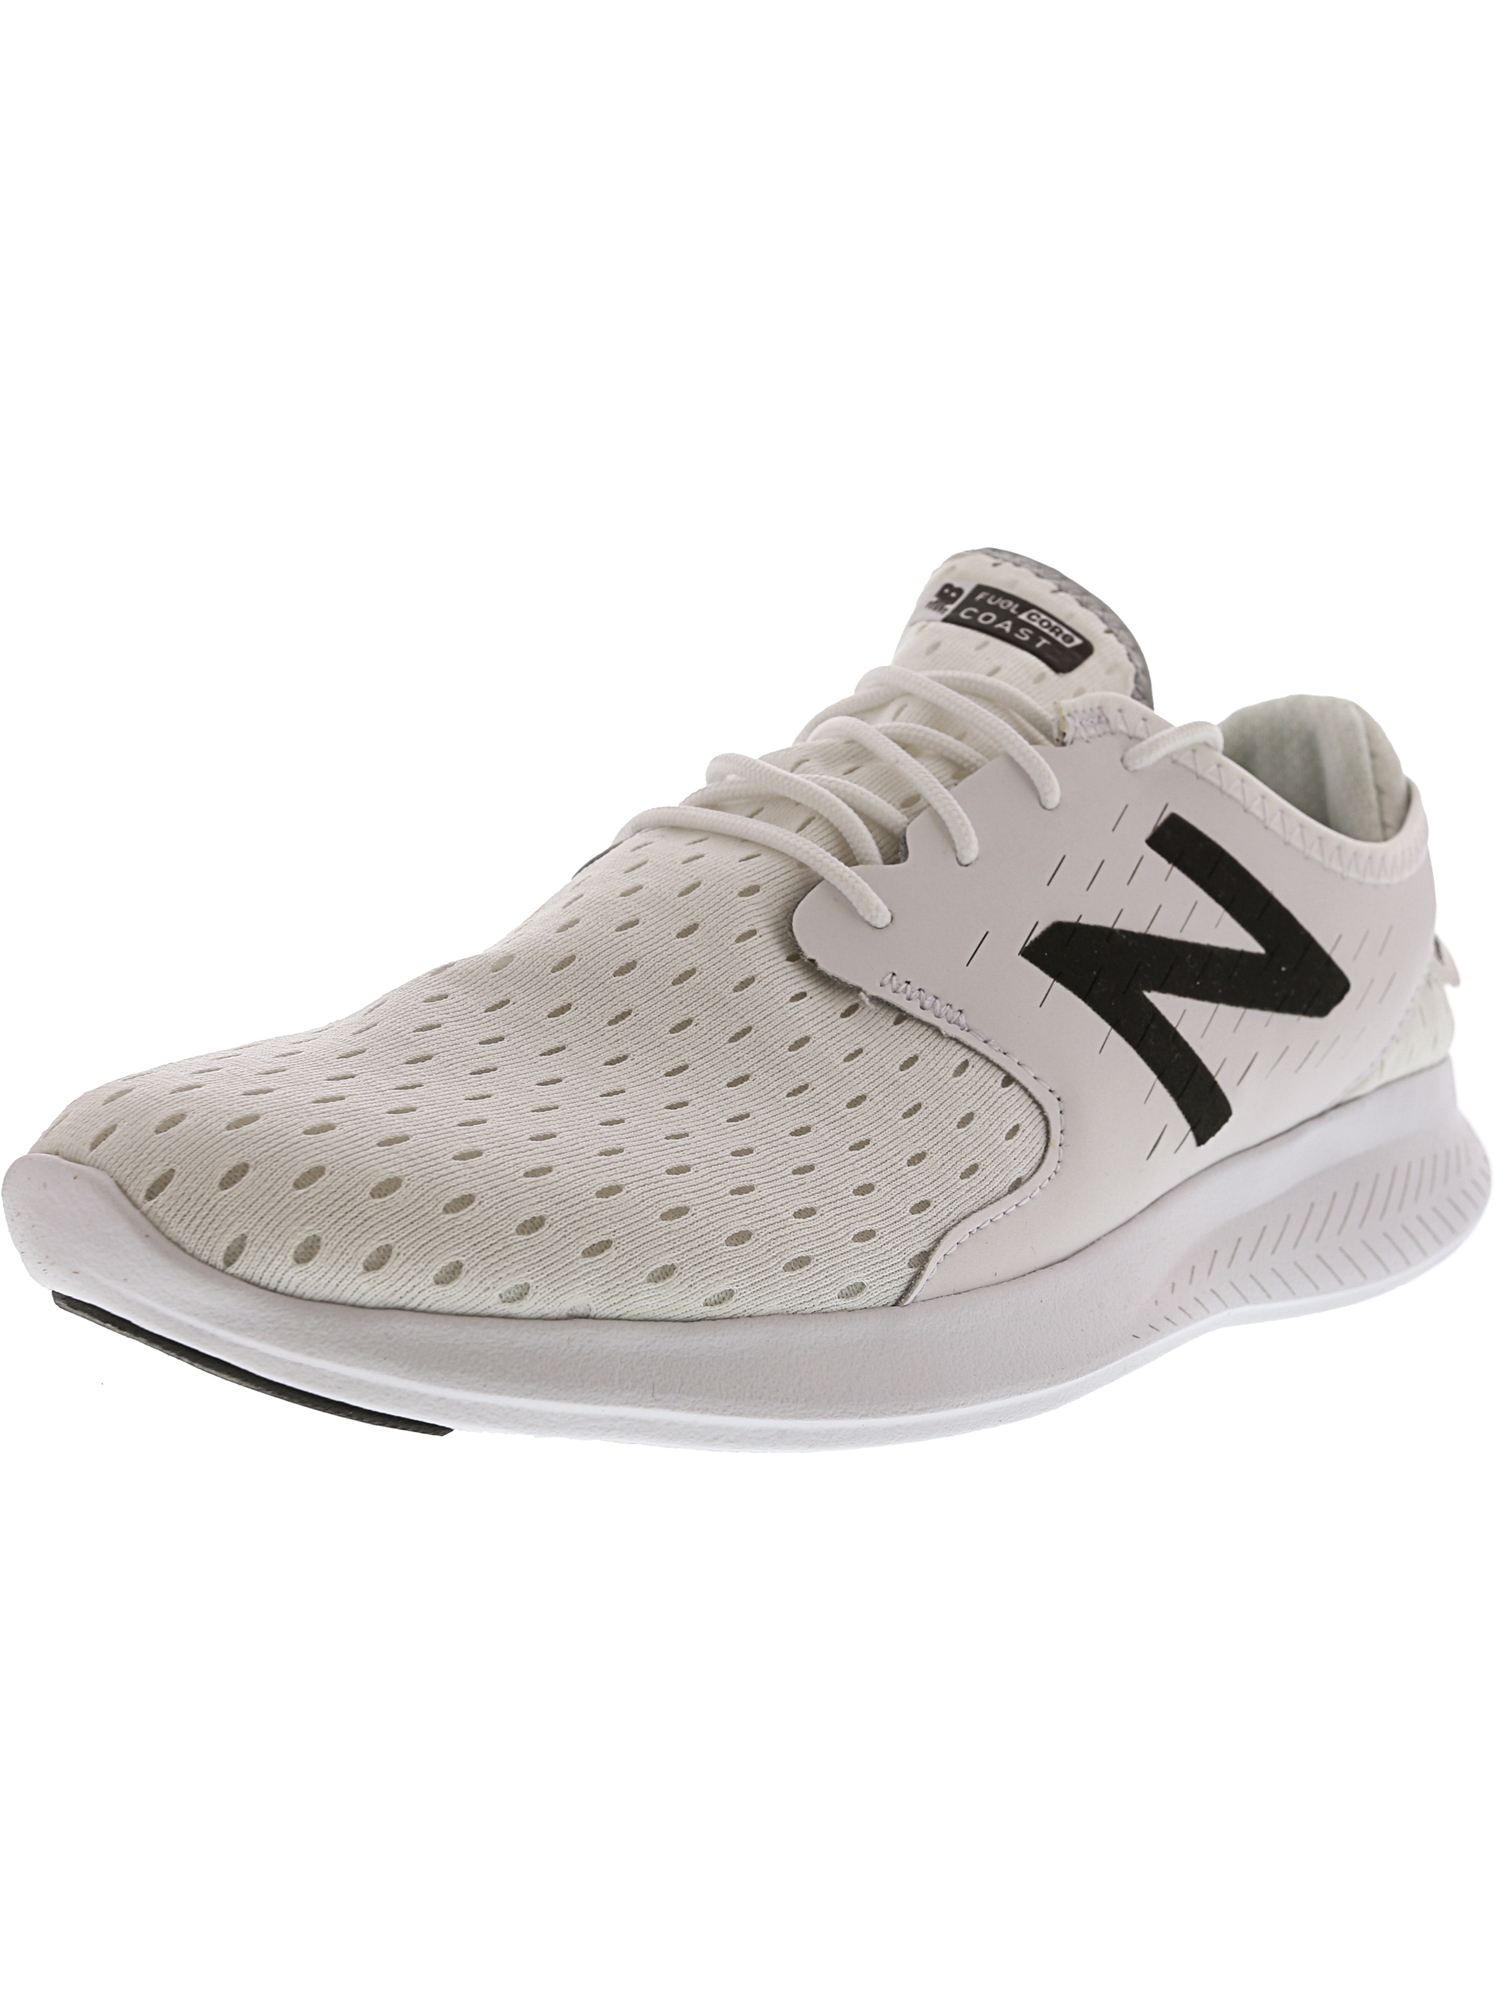 c01c1b98abf50 New Balance - New Balance Men's Mcoas Lw3 Ankle-High Suede Running Shoe -  11.5M - Walmart.com